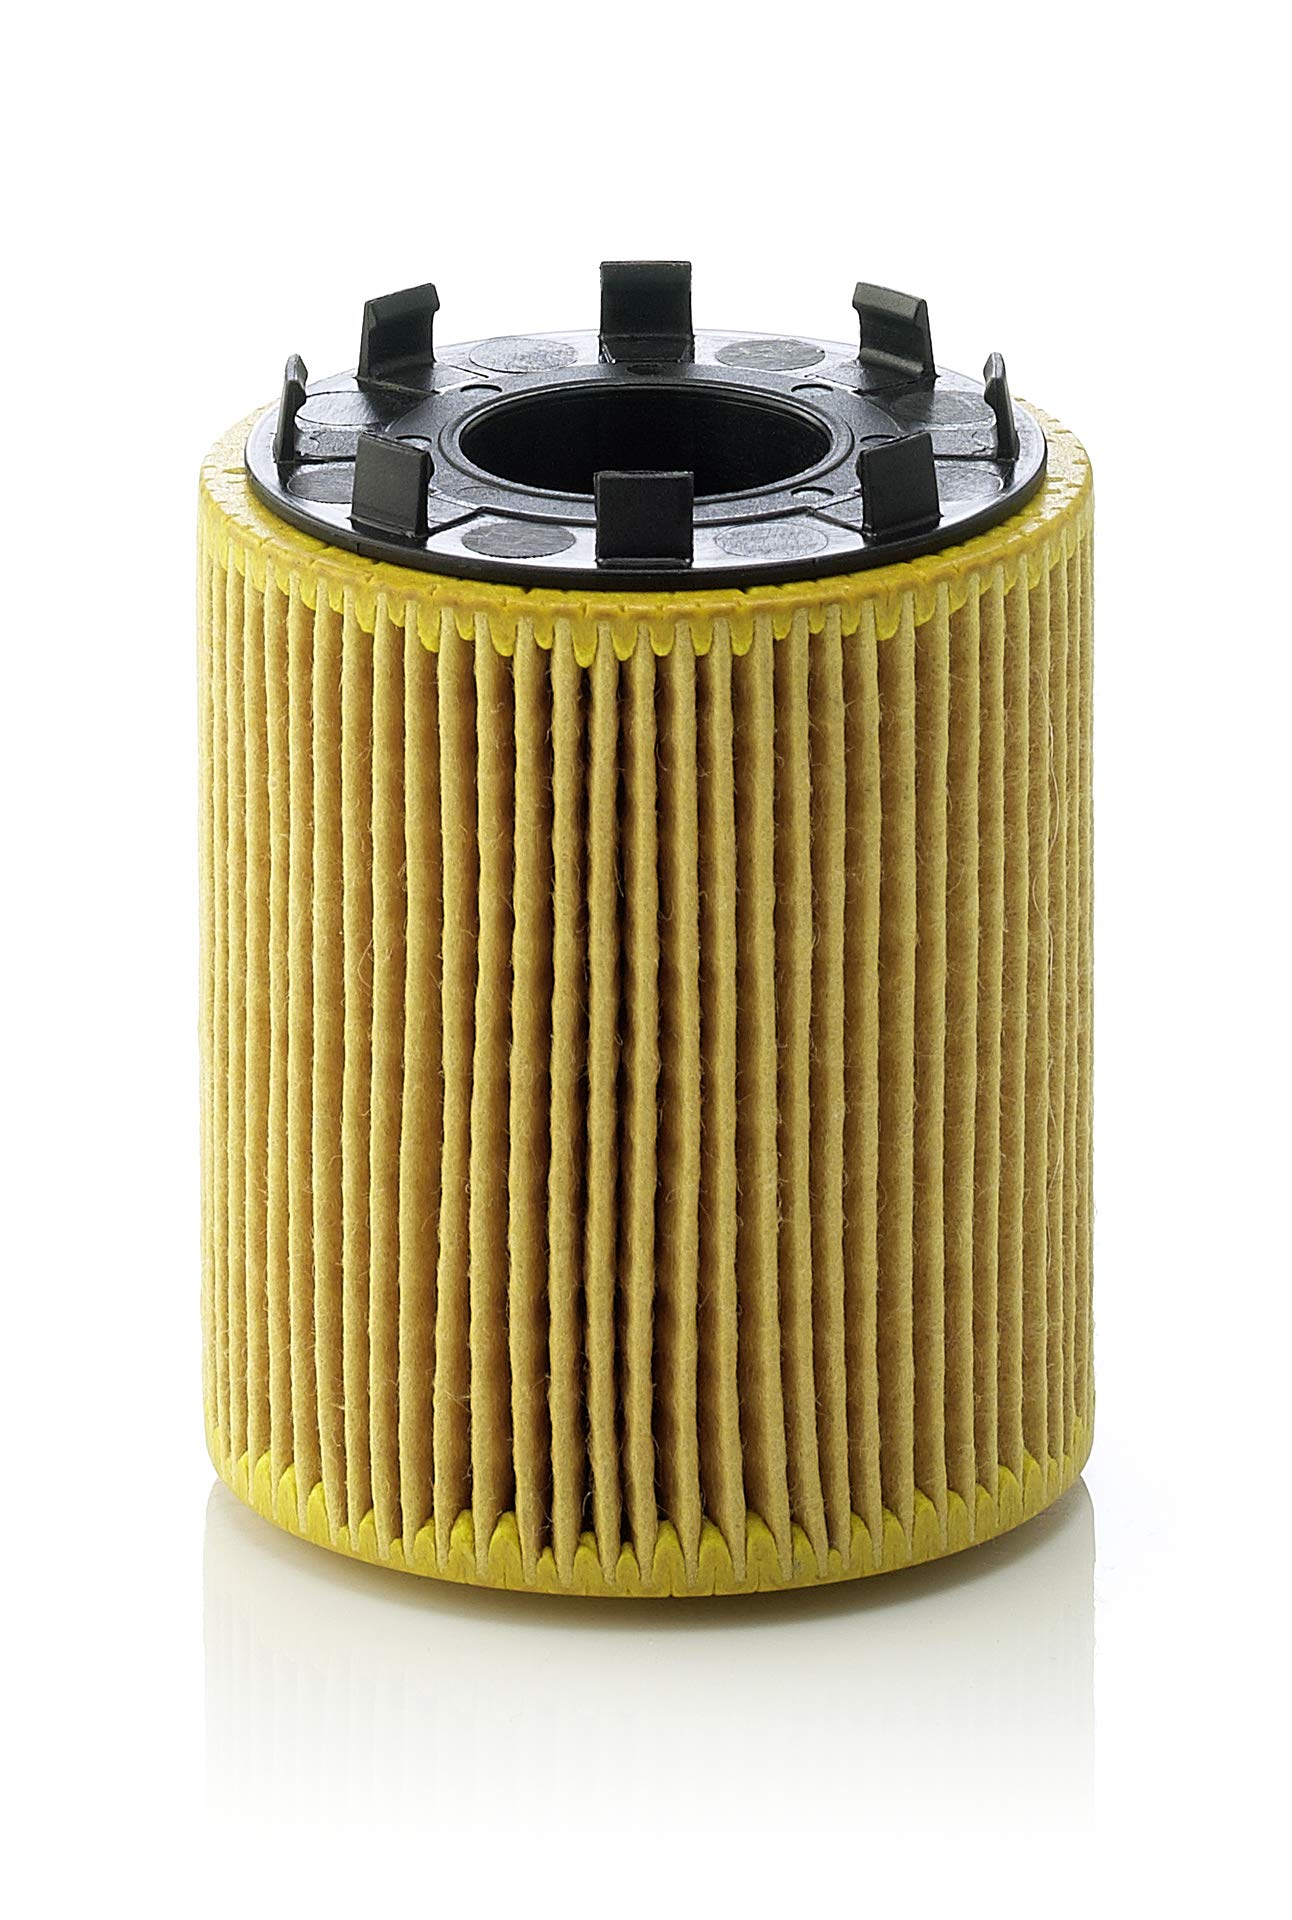 Mann Filter HU 8001 x Metal Free Oil Filter Element